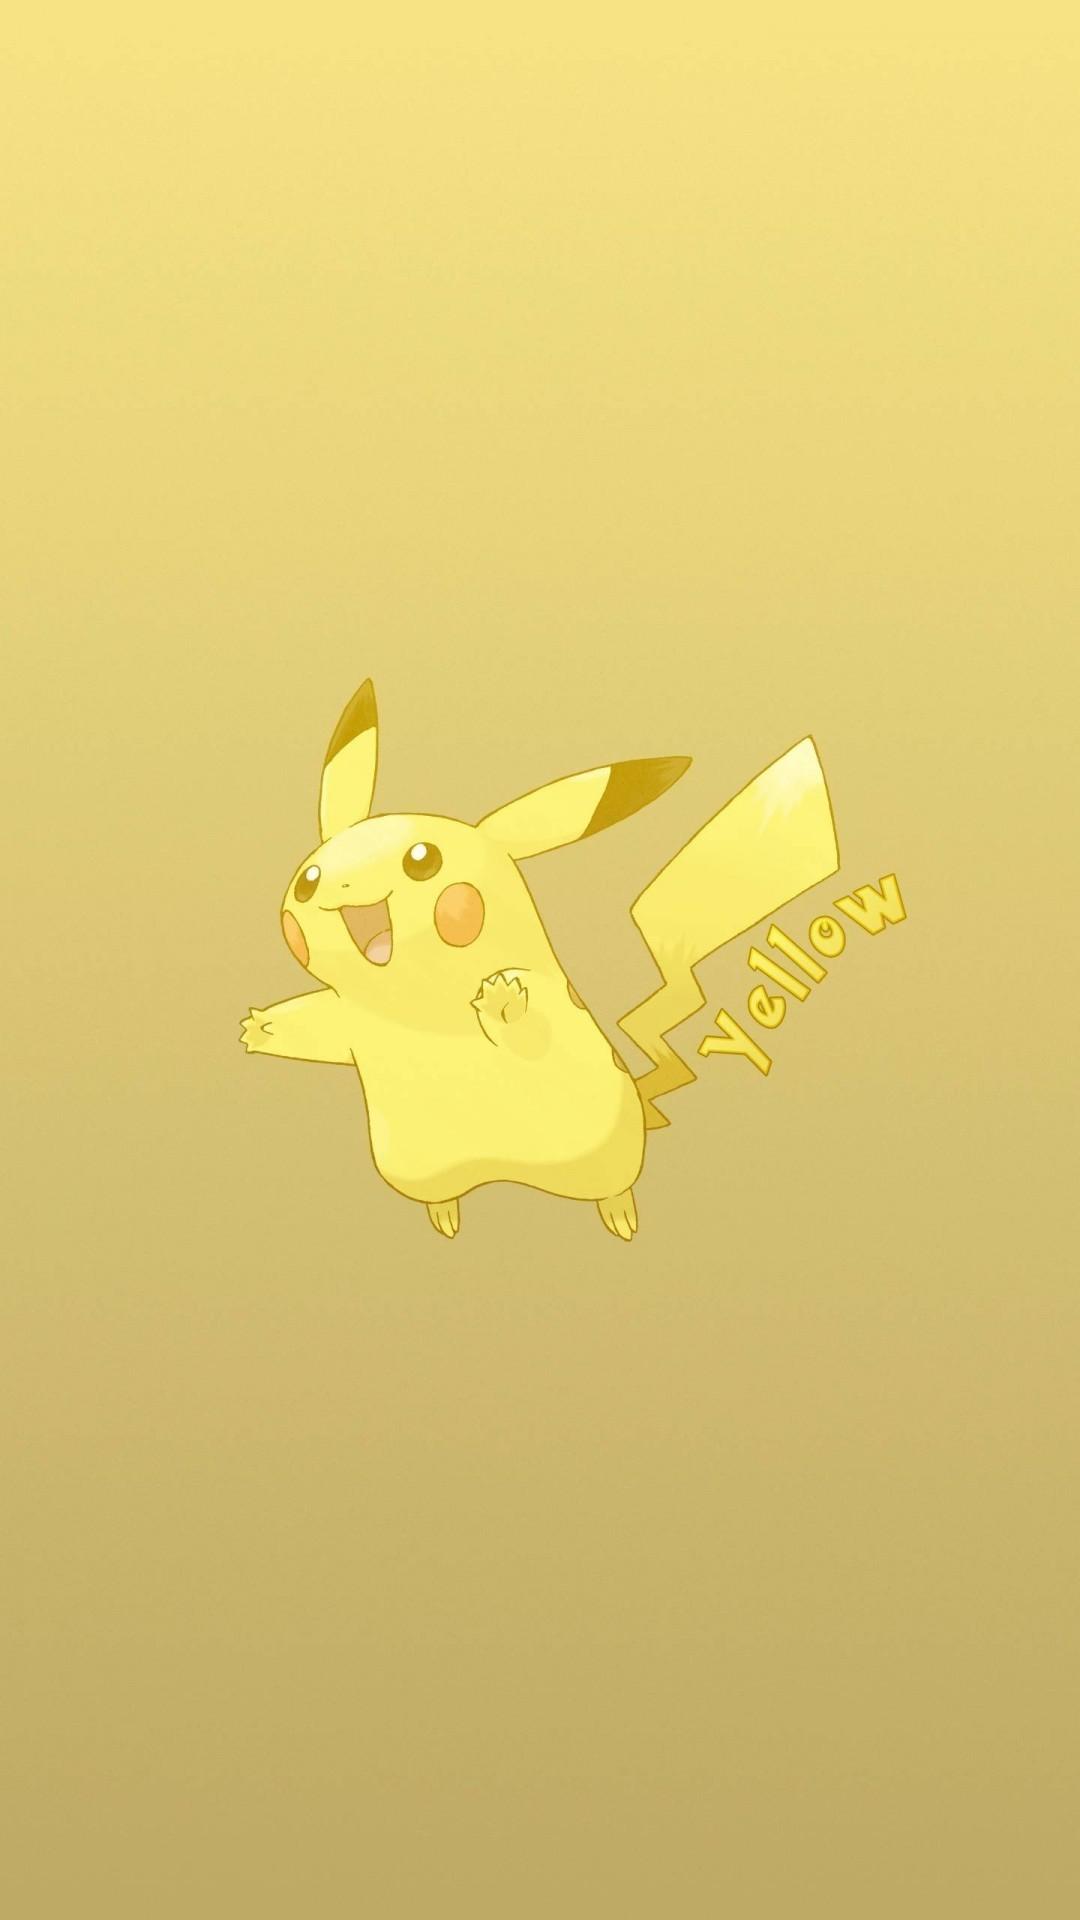 Cute Wallpaper For S5 Pokemon Wallpaper Pikachu 72 Images